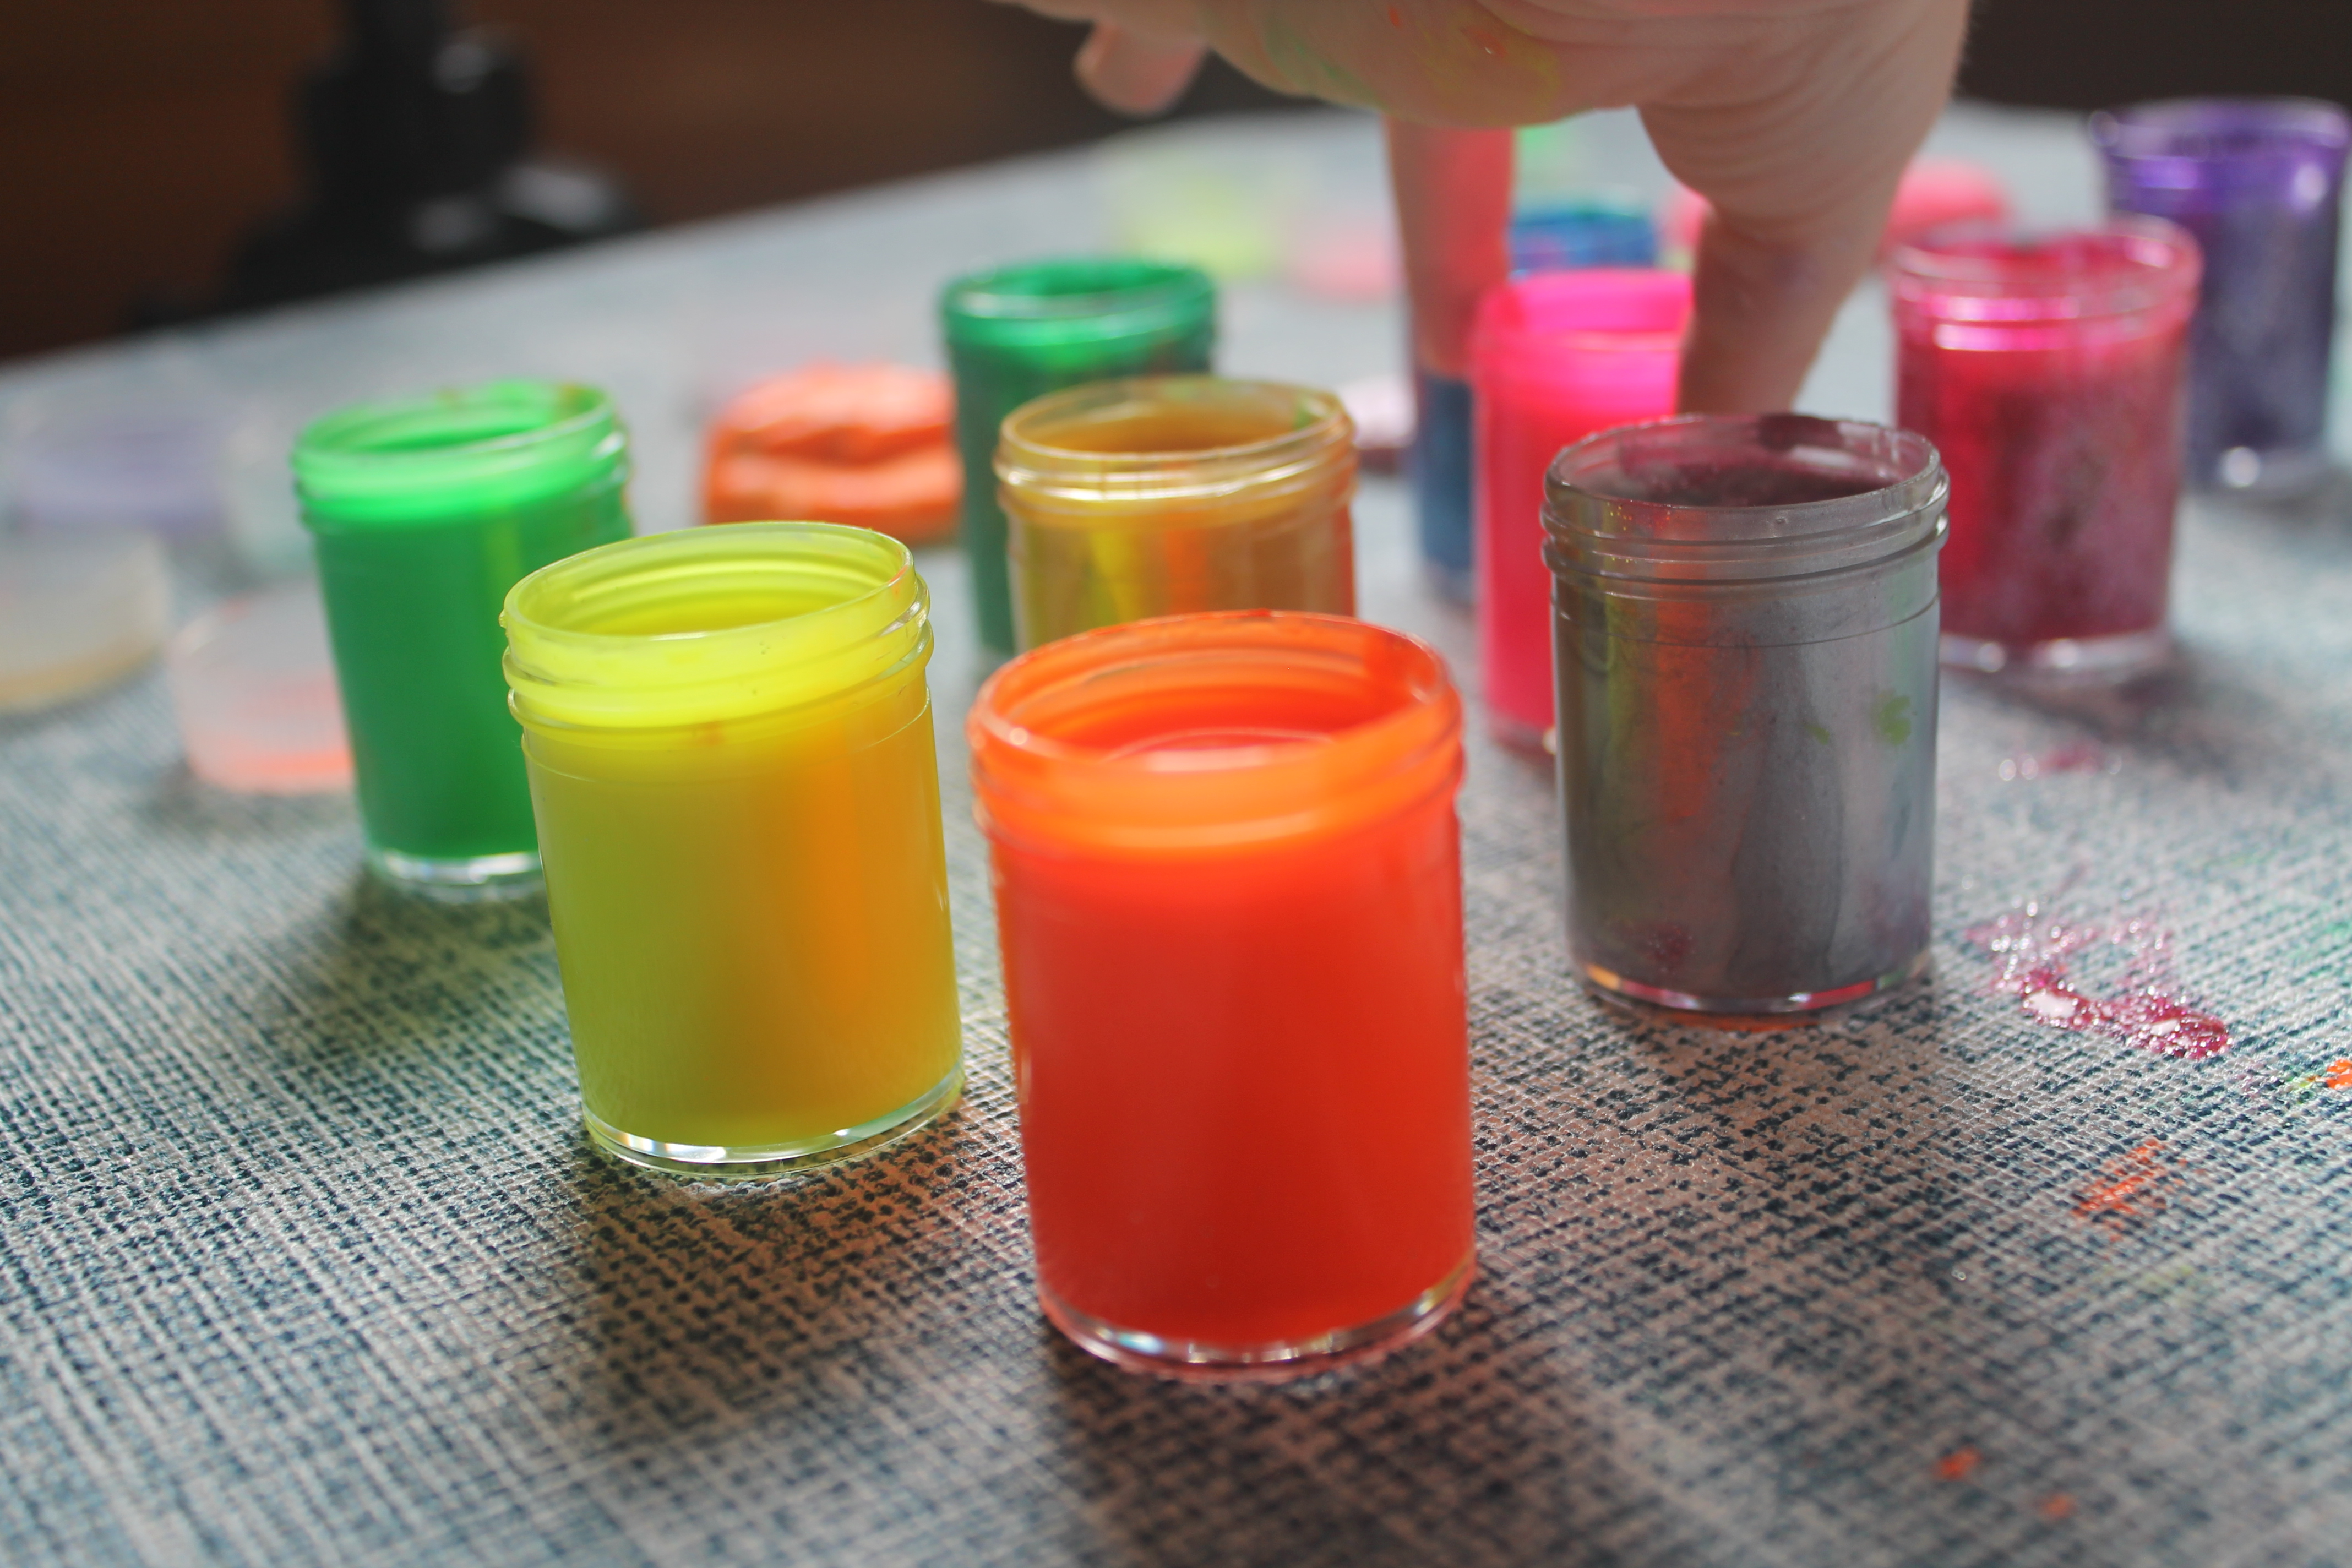 farby fluorescencyjne i z brokatem Moja Bambino - nasza droga do - masa solna